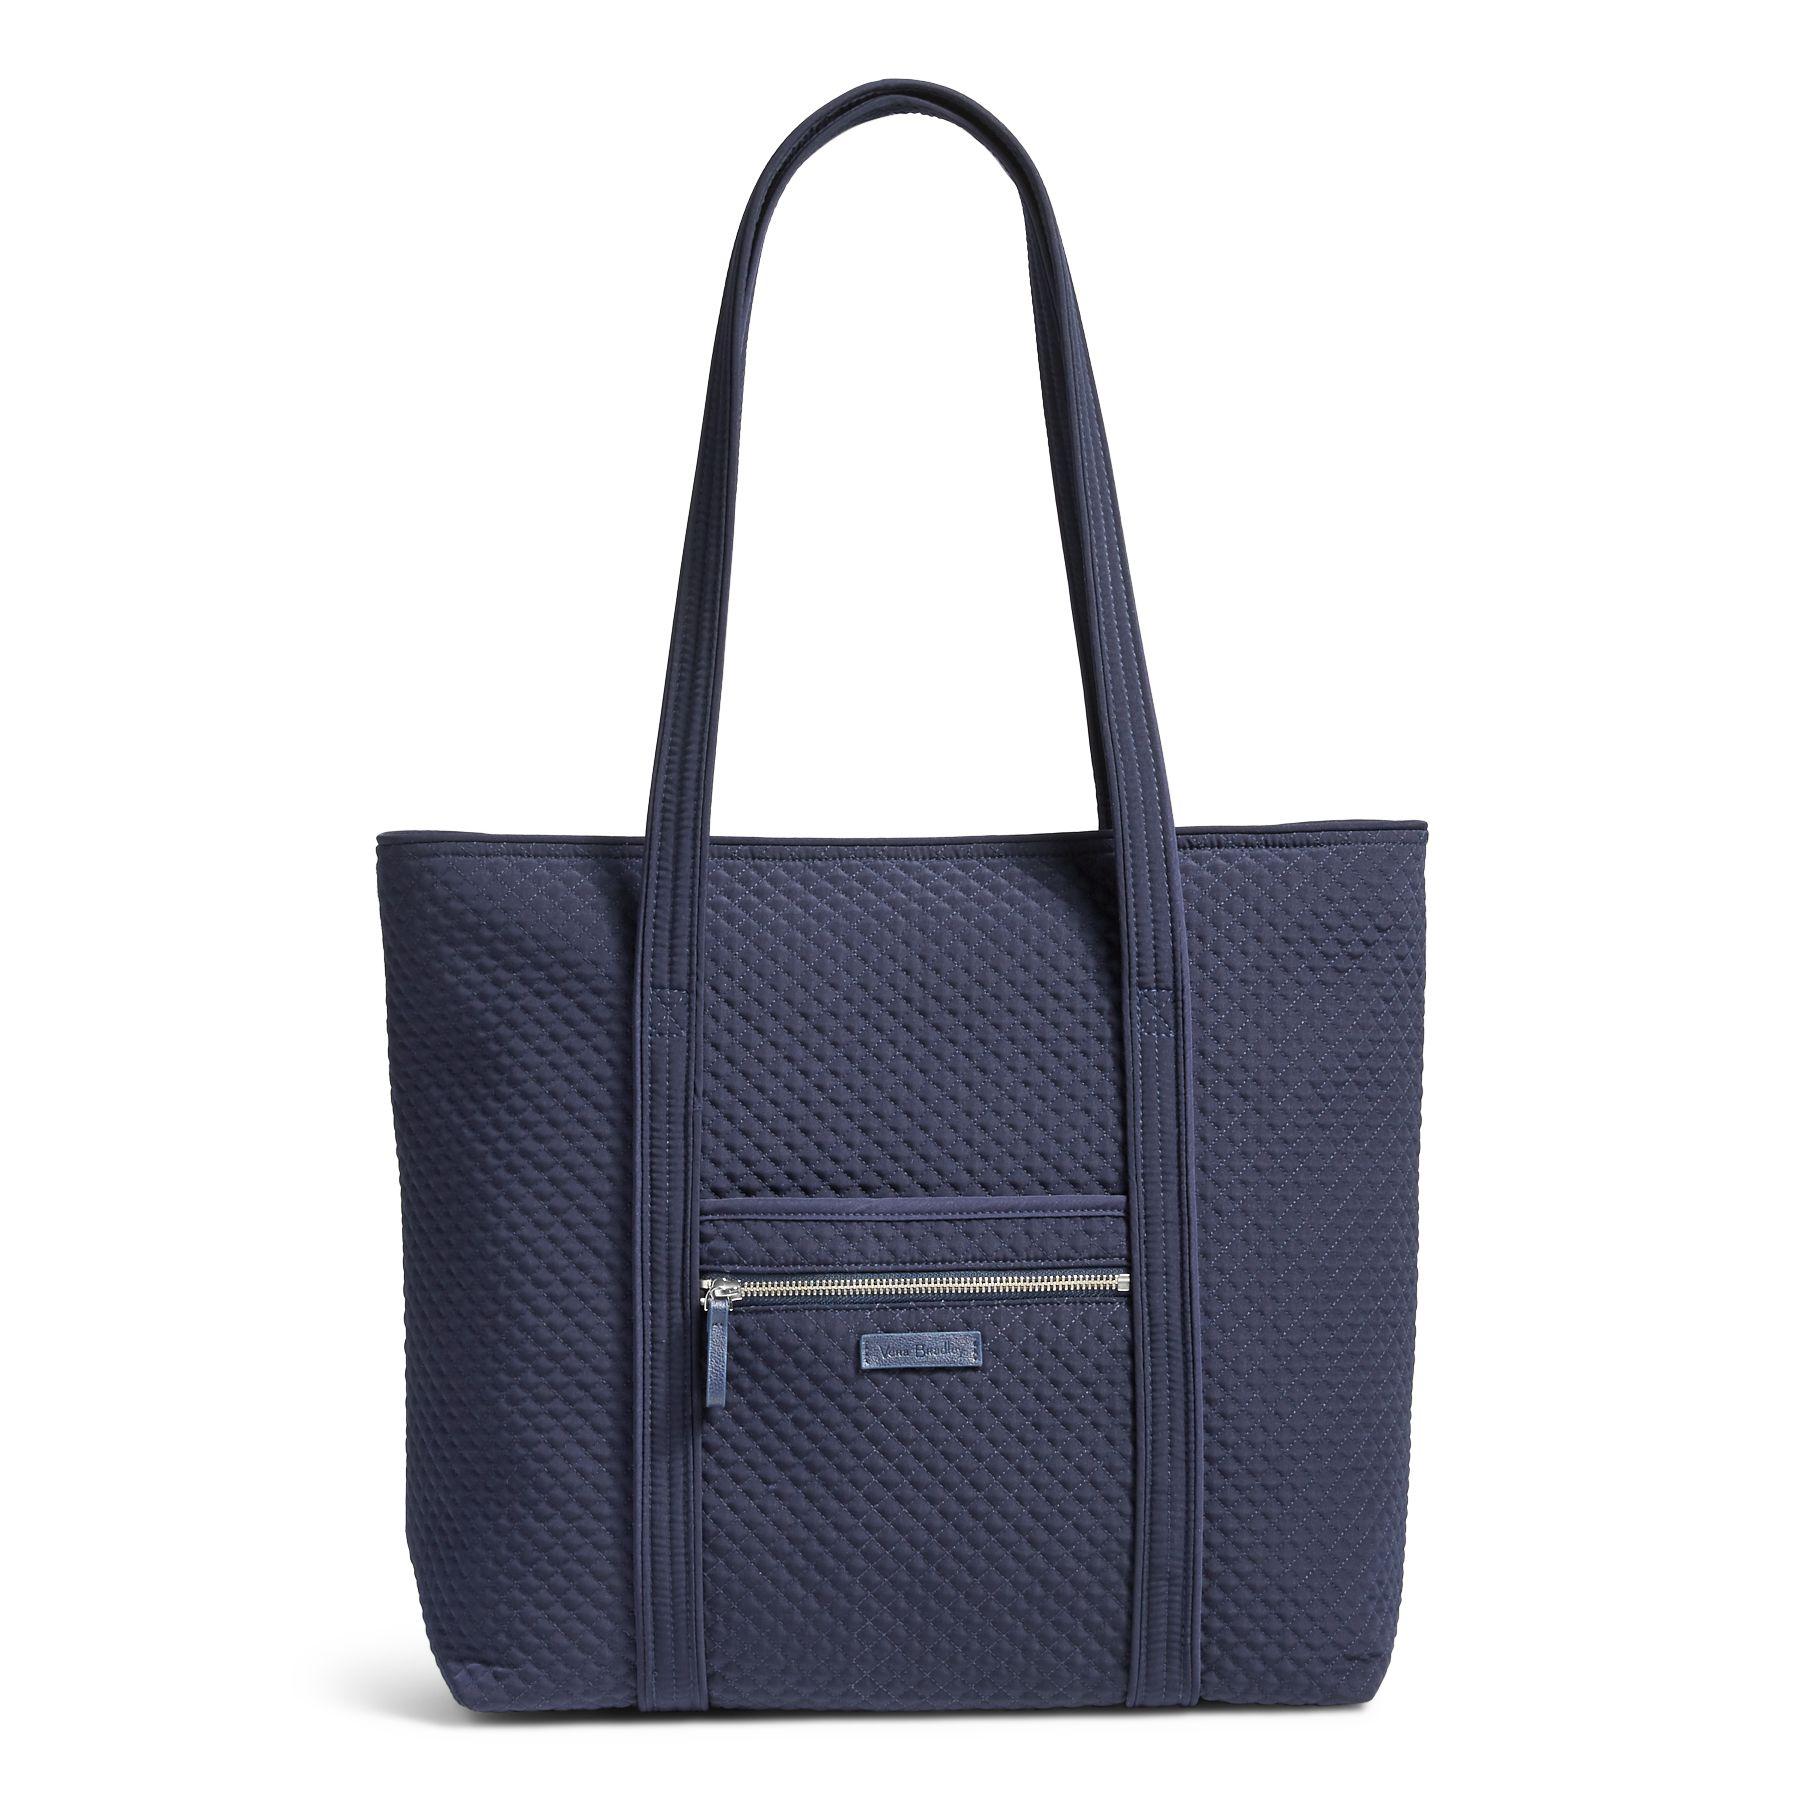 625aa1aa17 Black Tote Bags for Women - Bags